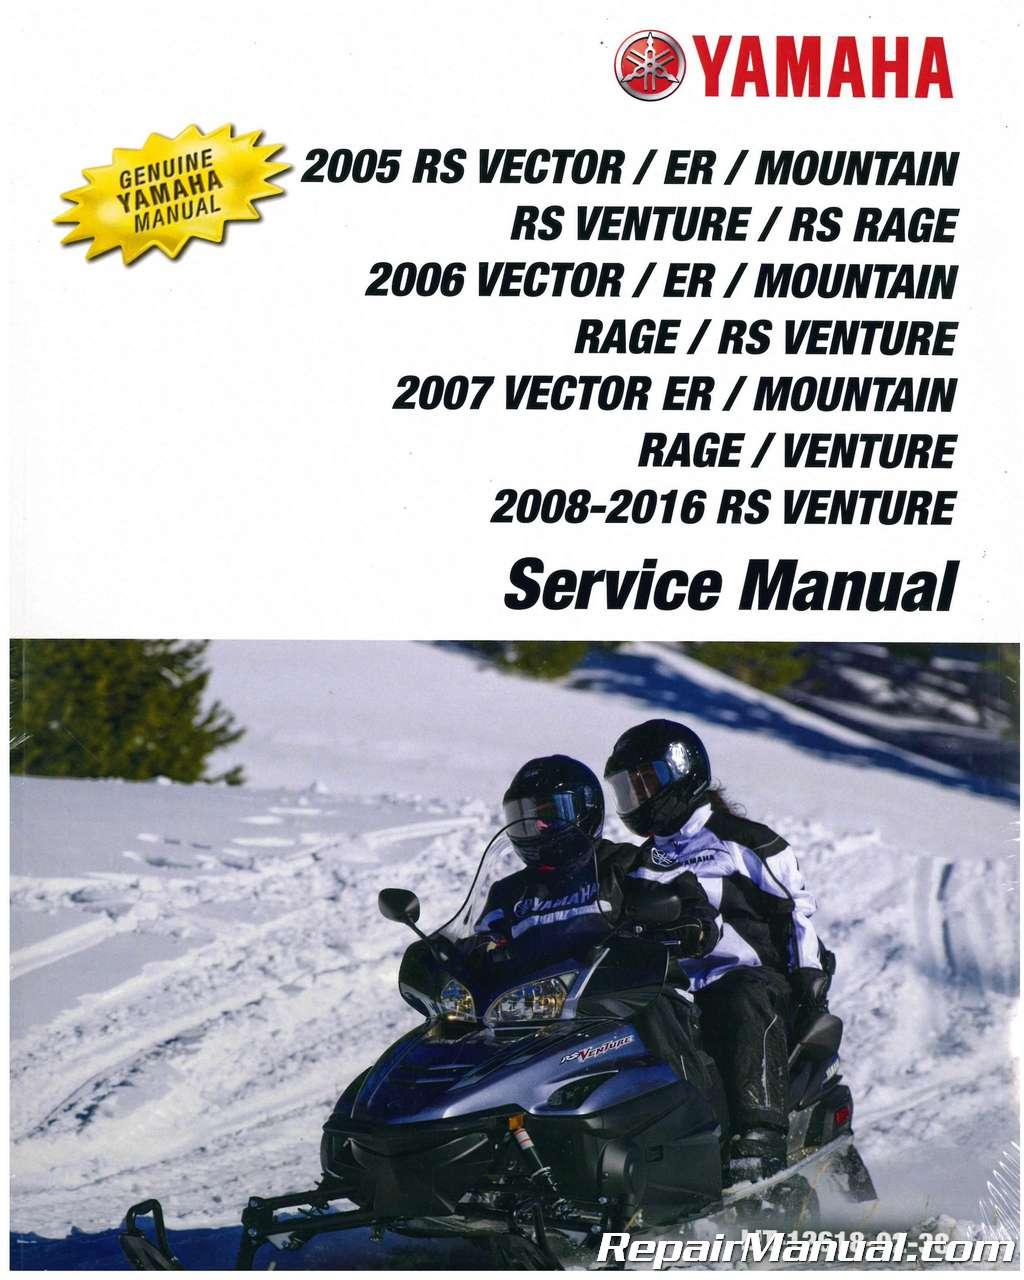 2006 yamaha snowmobile service manual free download